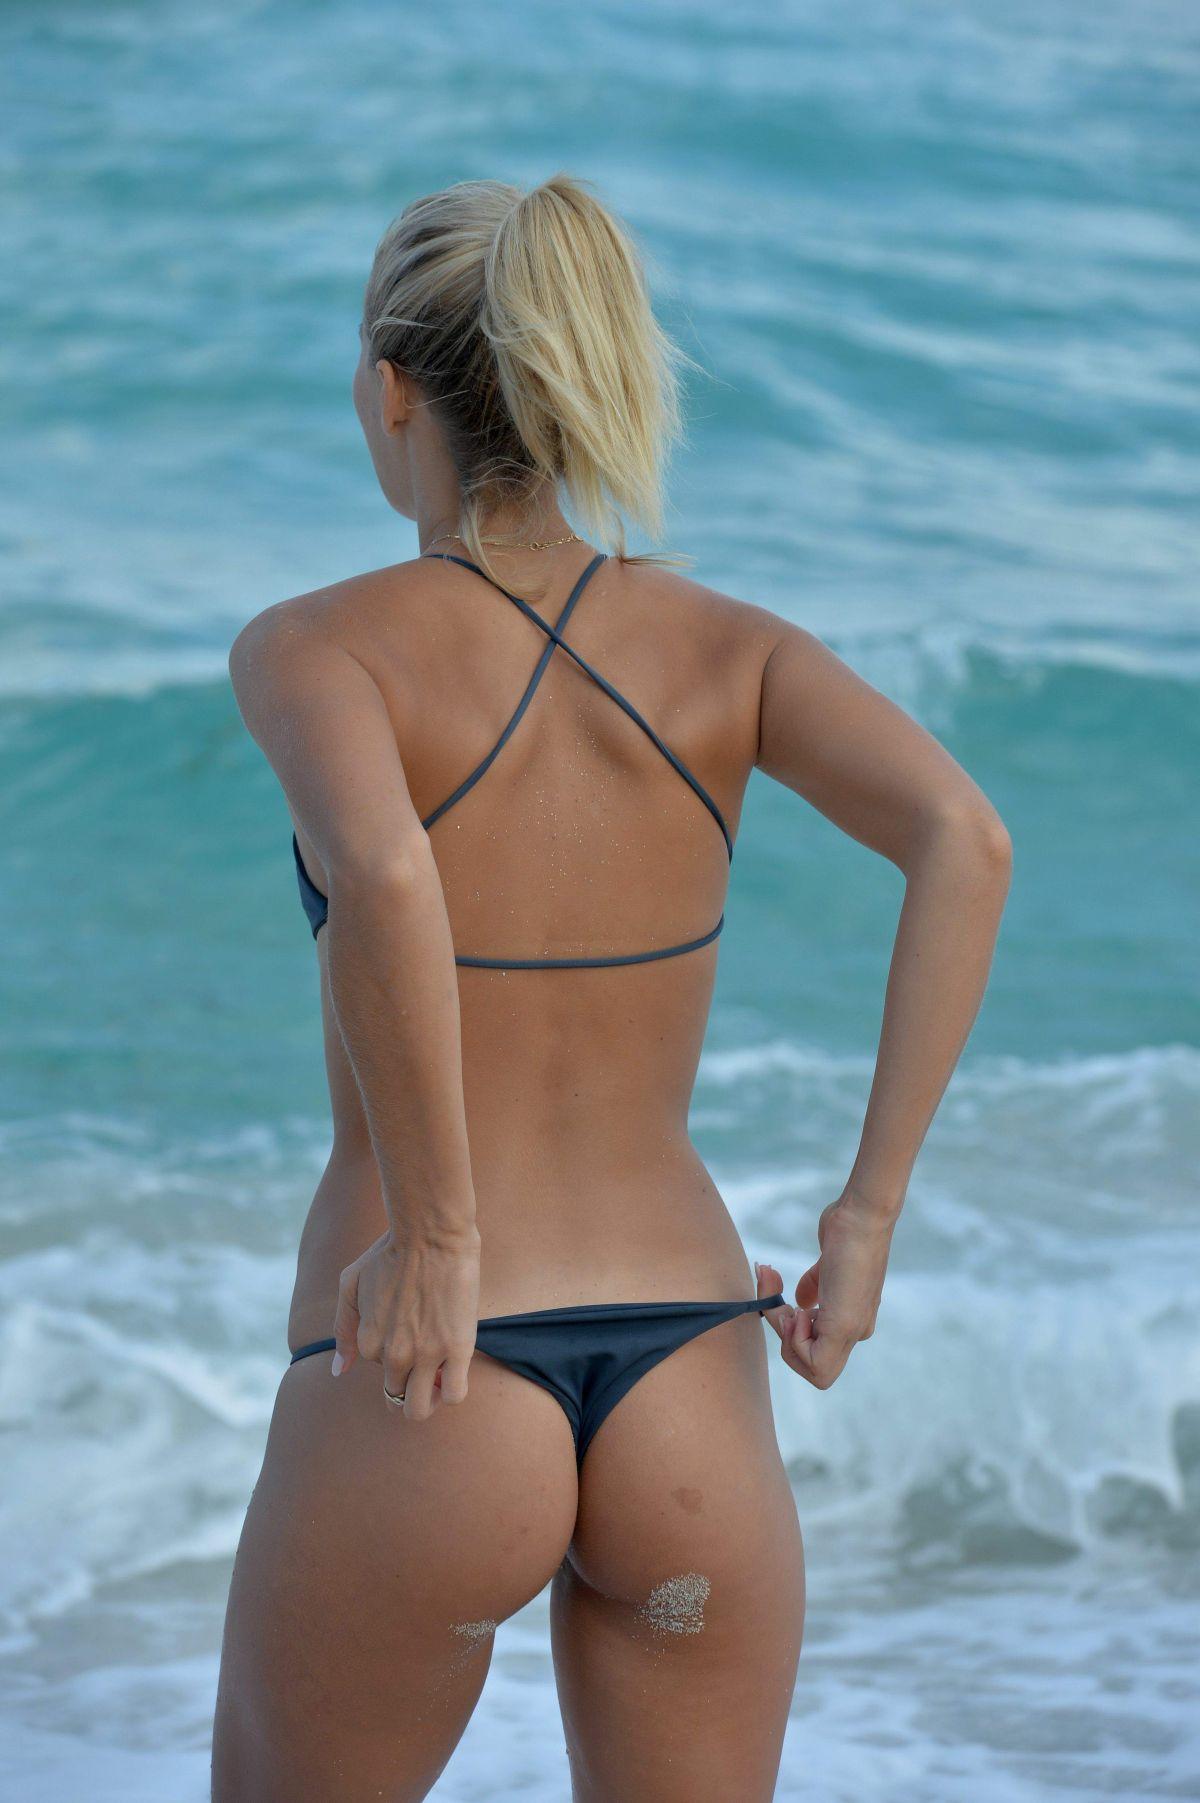 Michelle Hunziker Nipslip And Bikini Beach Photos